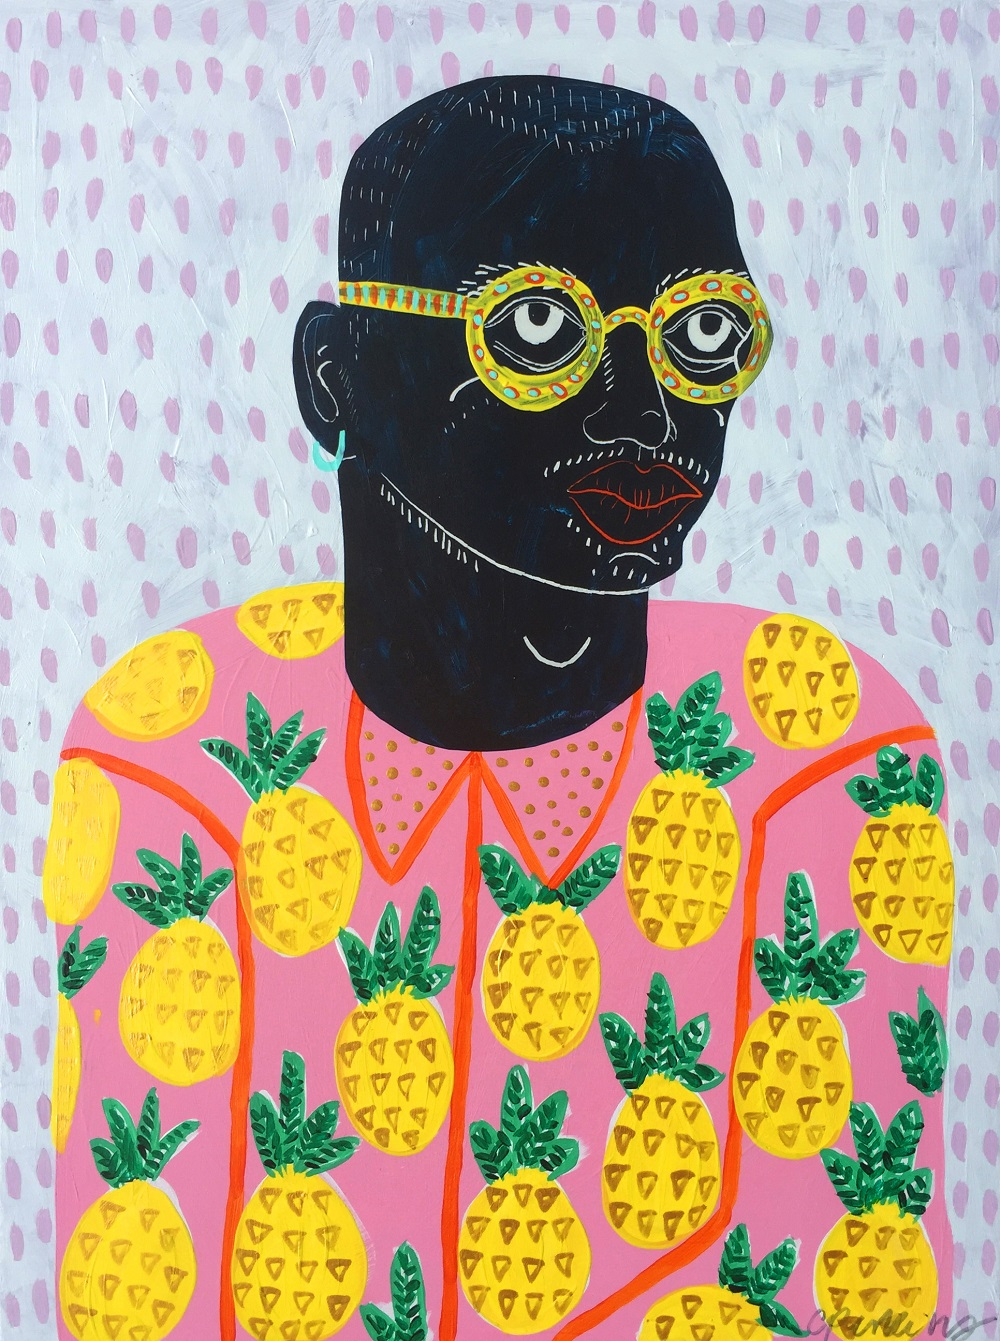 Camilla Perkins Illustrations - Design Peeper